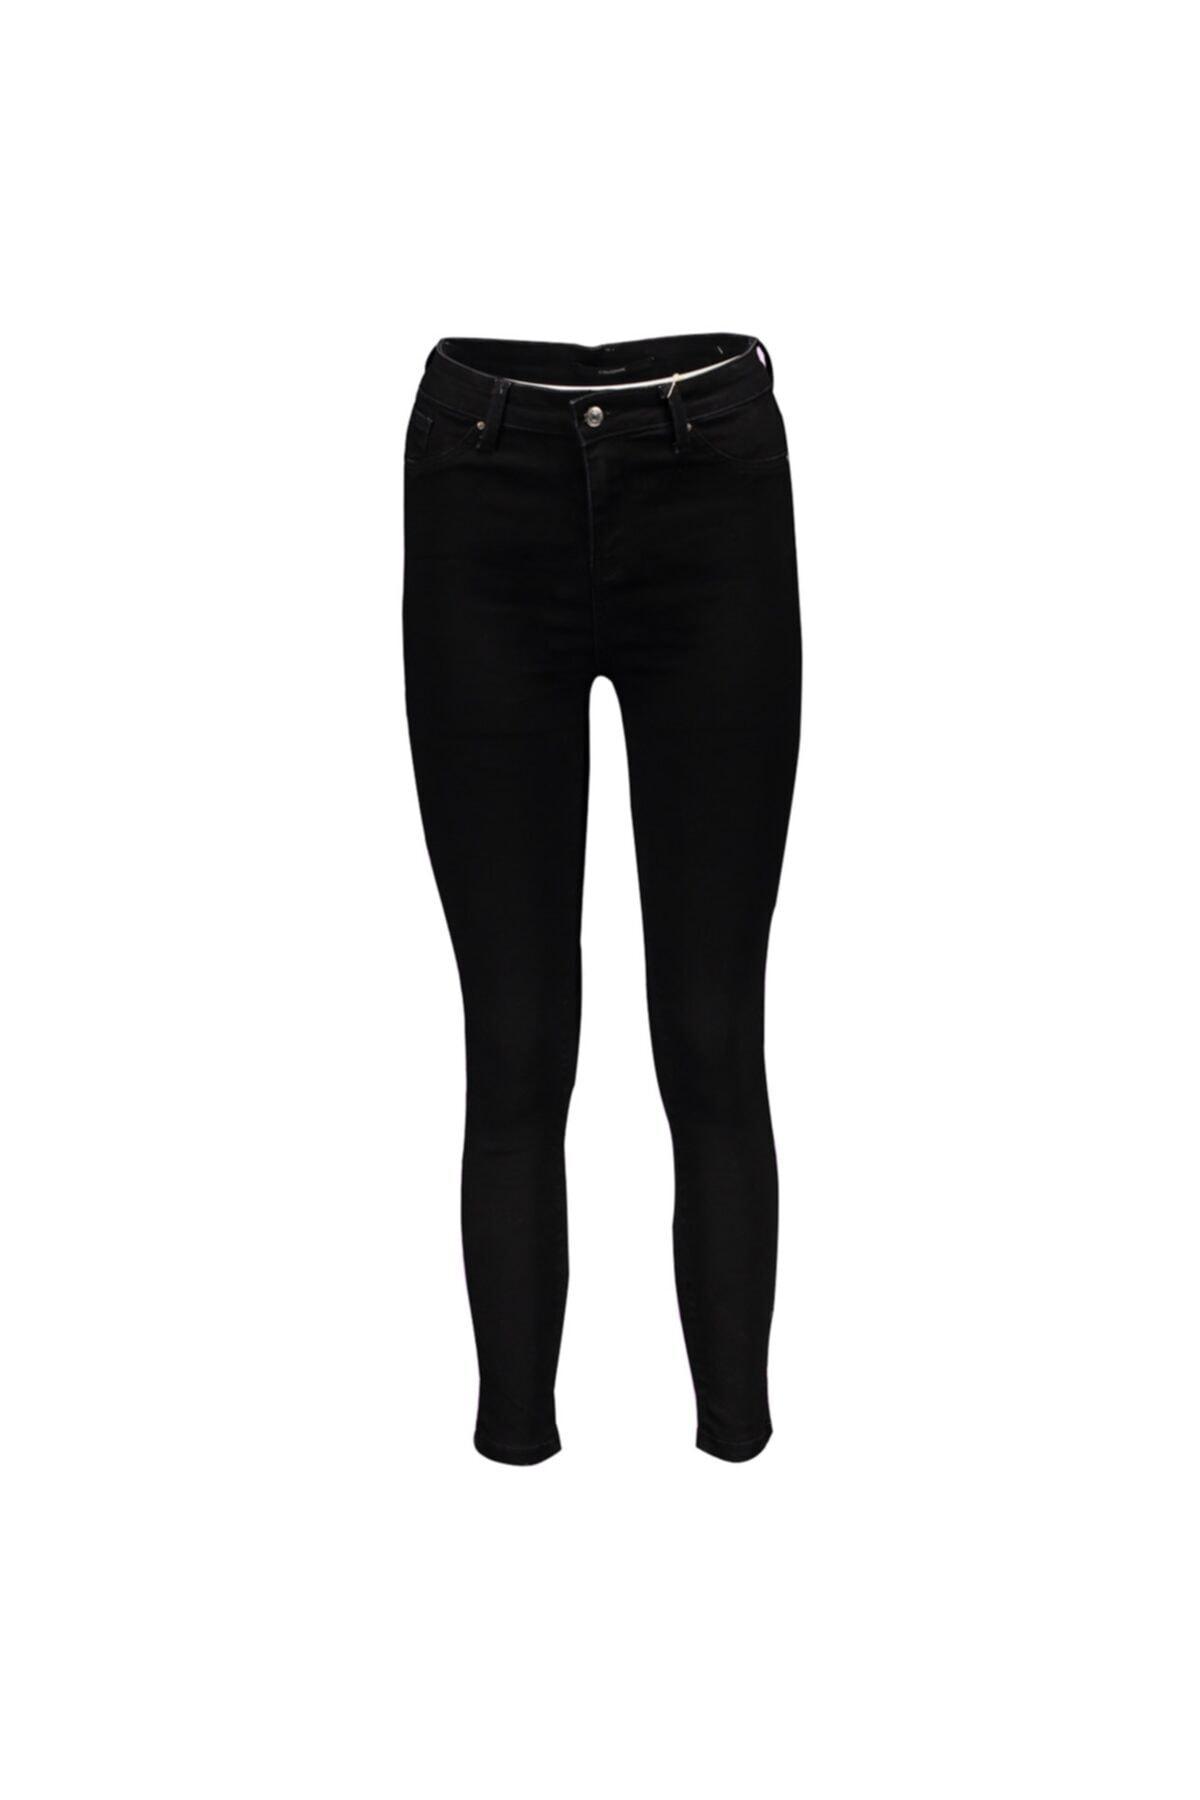 Collezione Sıyah Kadın Pantolon 1